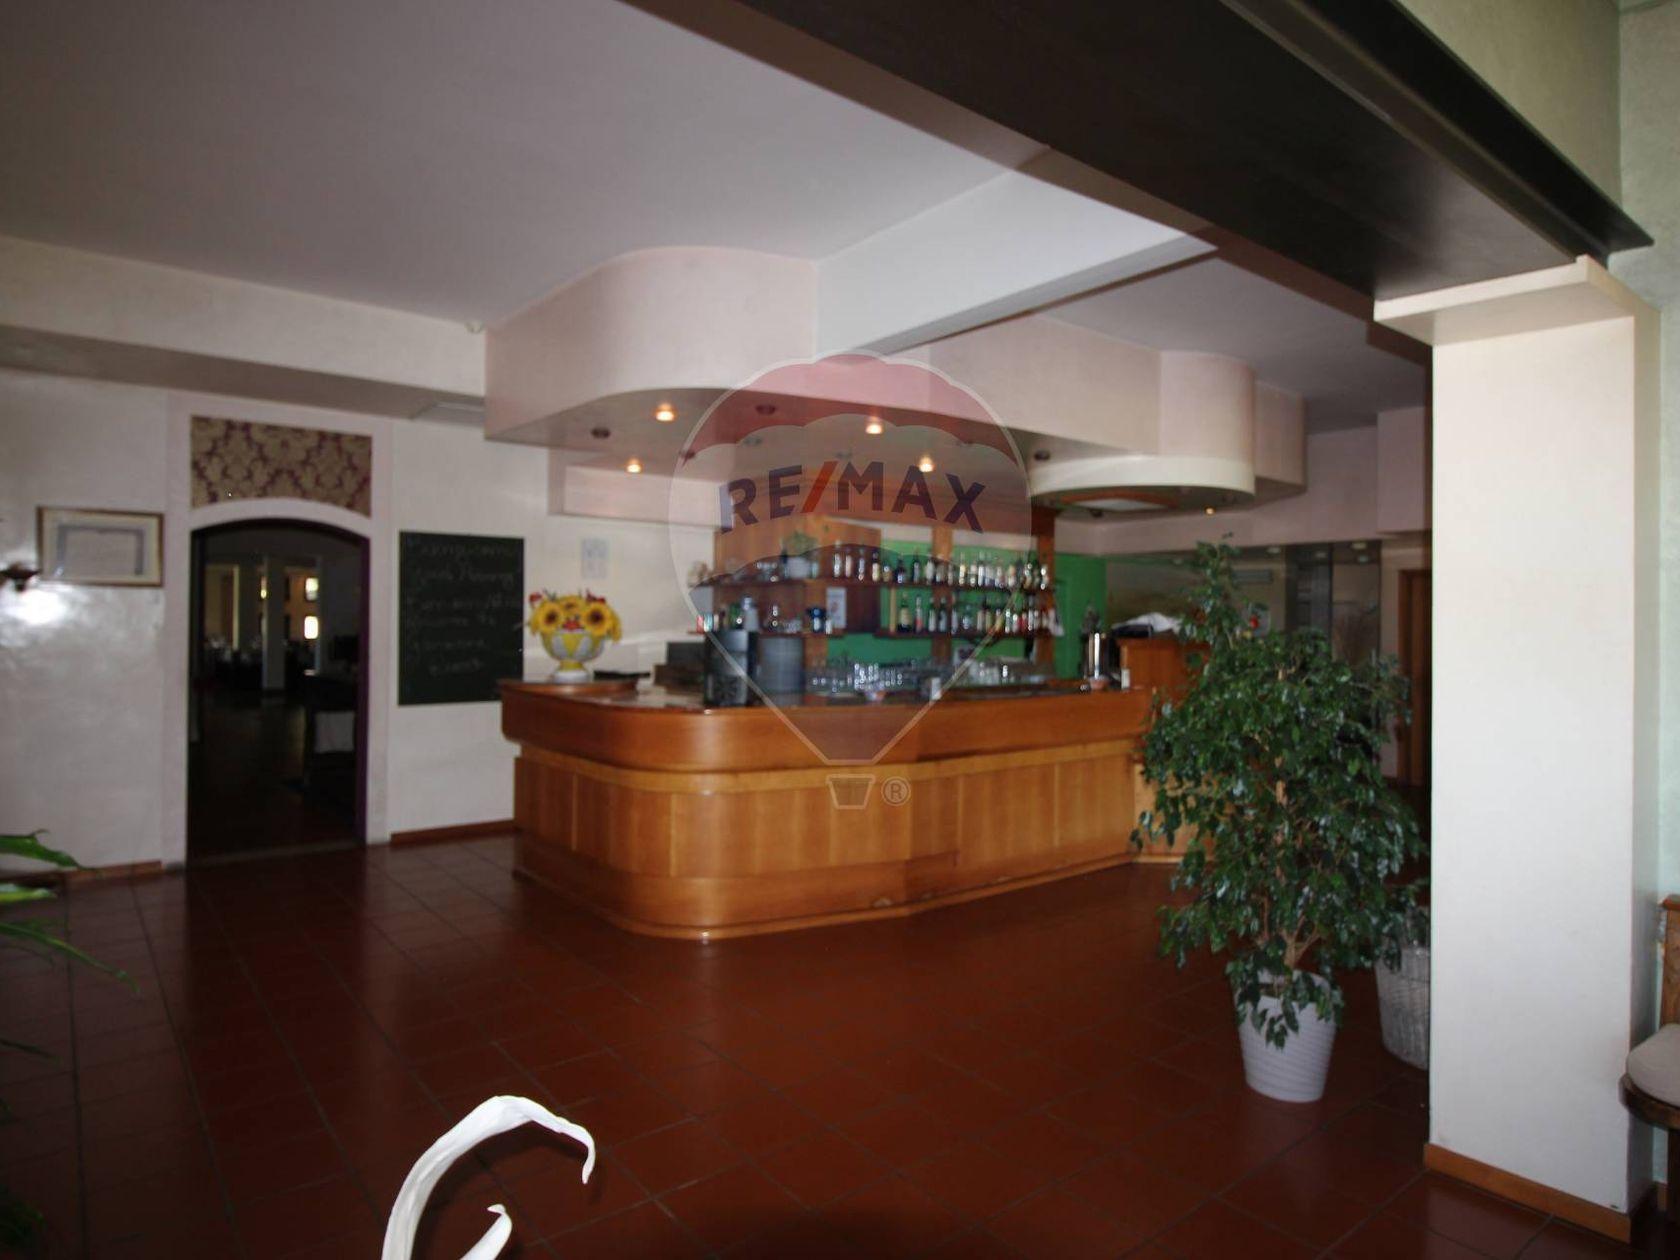 Albergo/Hotel Valmarana, Altavilla Vicentina, VI Vendita - Foto 3